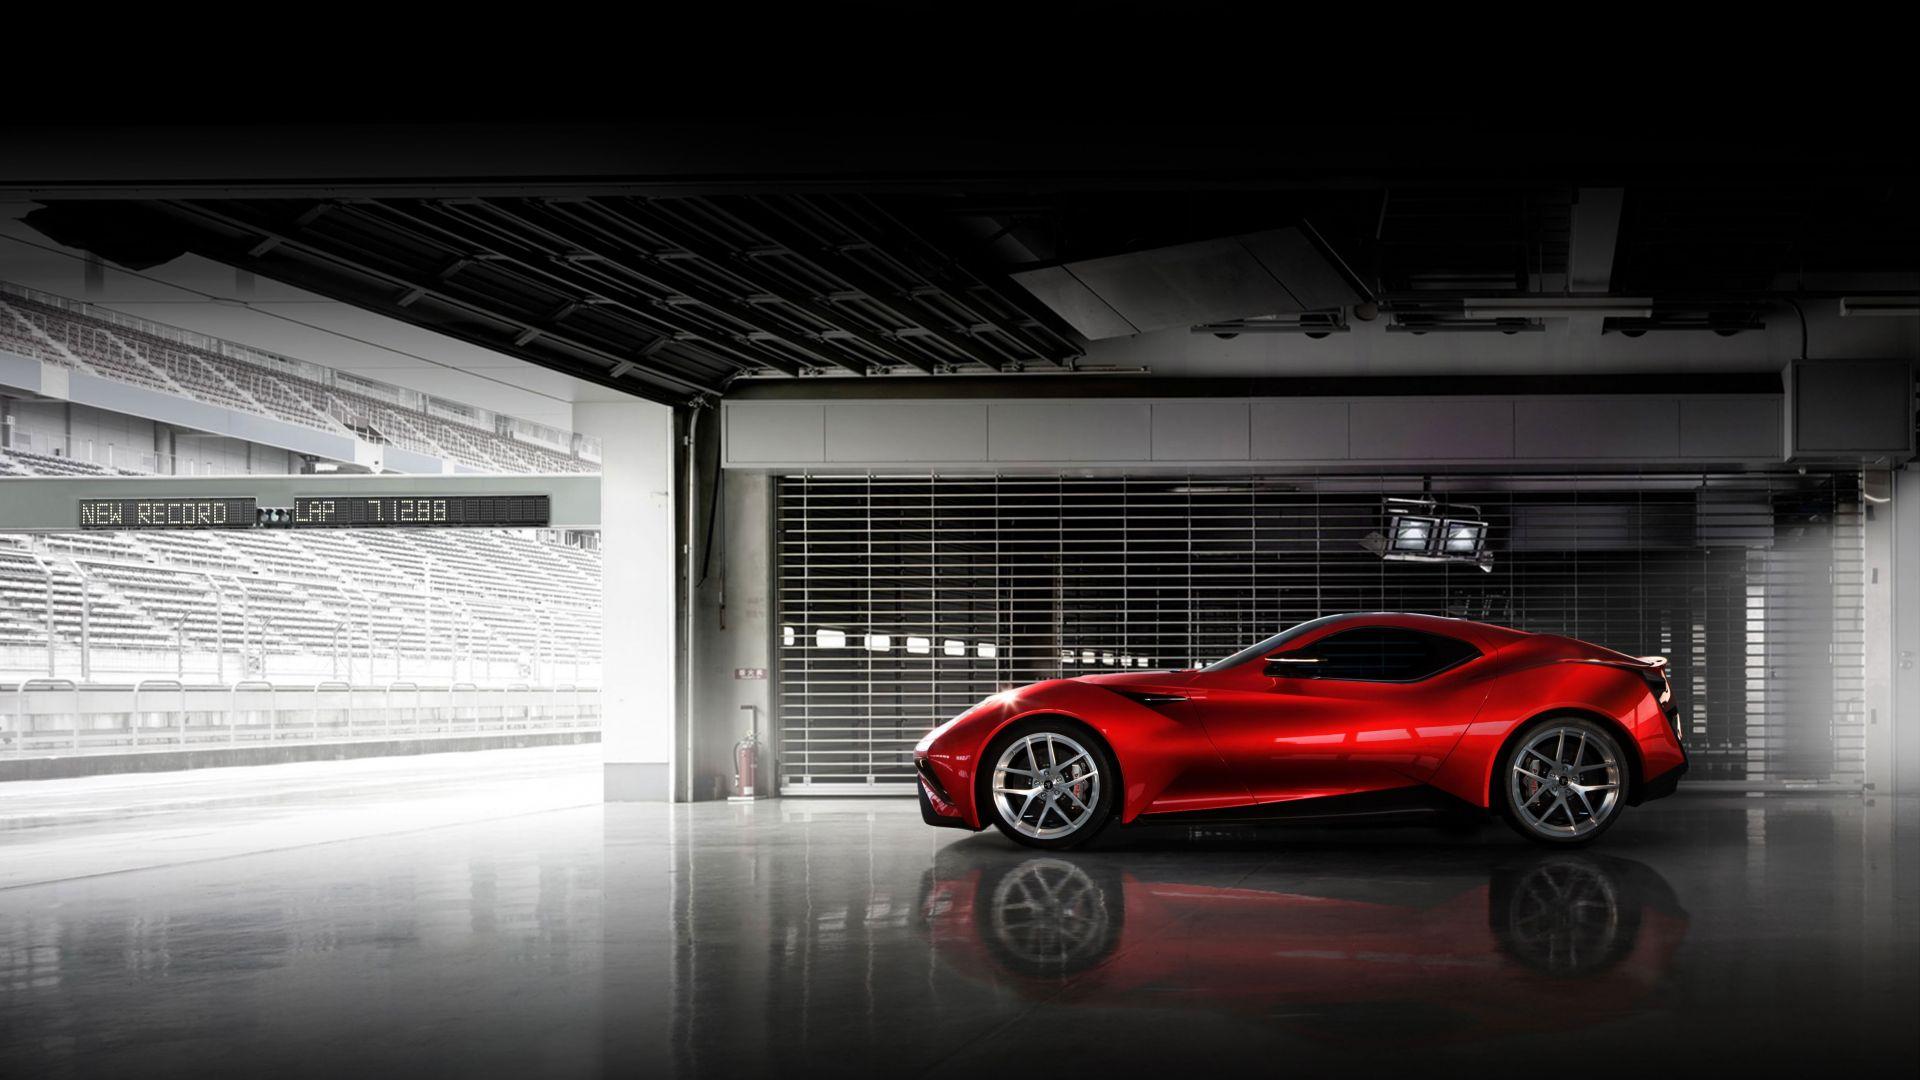 Wallpaper Icona vulcano hybrid car side view